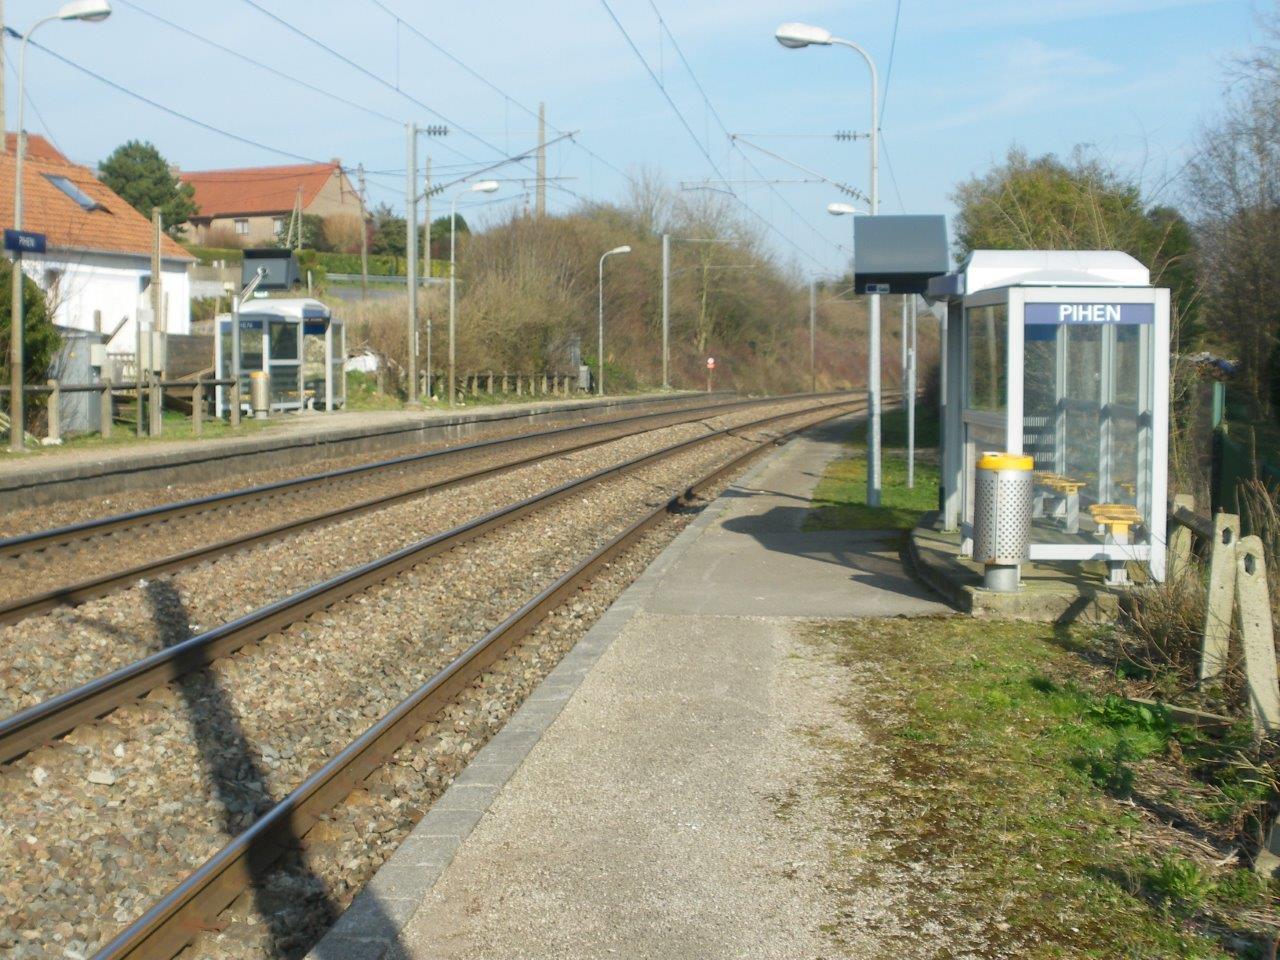 gare-de-pihen-train-station